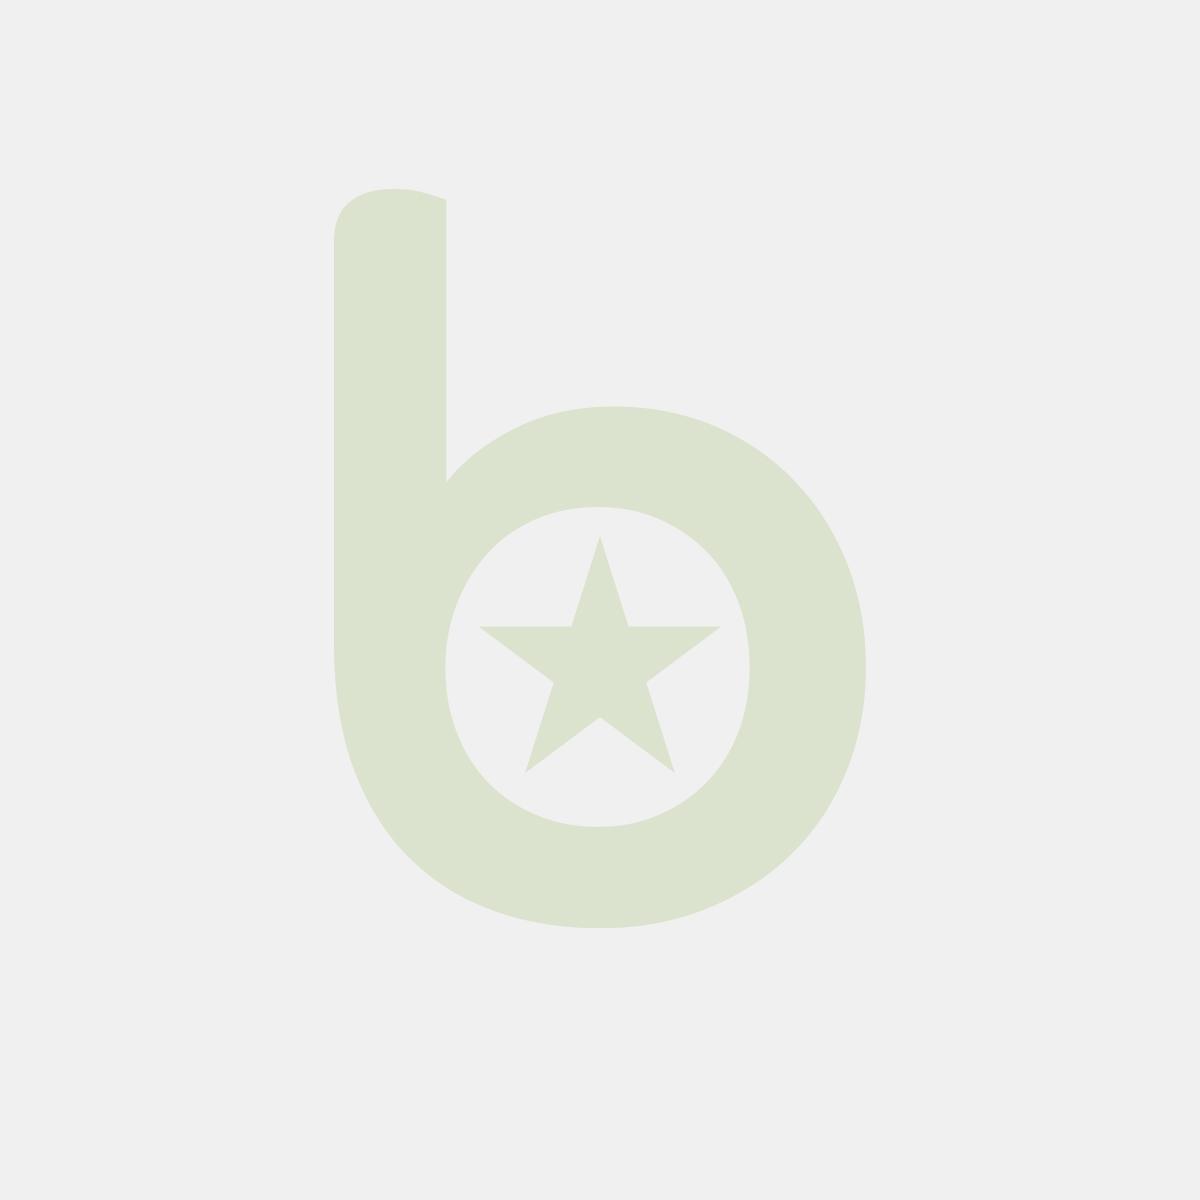 Bieżnik PAPSTAR ROYAL Collection w rolce 24m/40cm limonka, bibuła